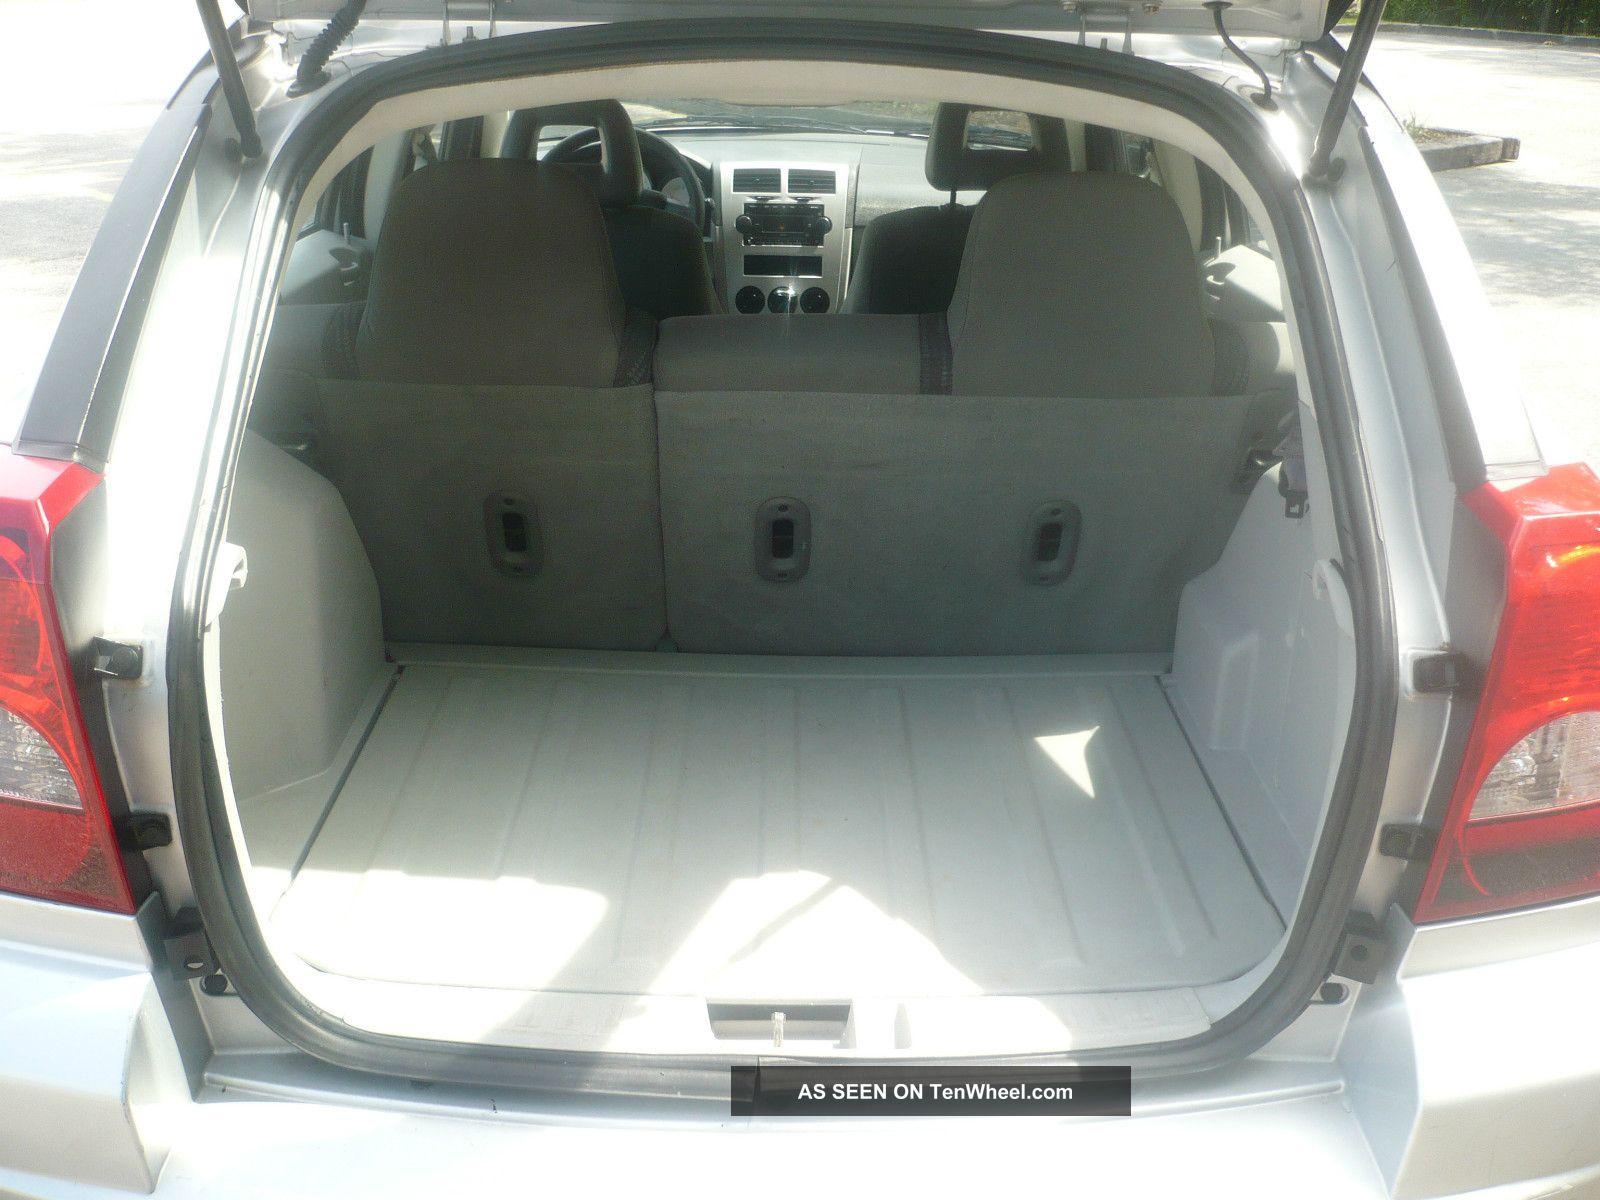 2007 dodge caliber sxt hatchback 4 door 2 0l. Cars Review. Best American Auto & Cars Review